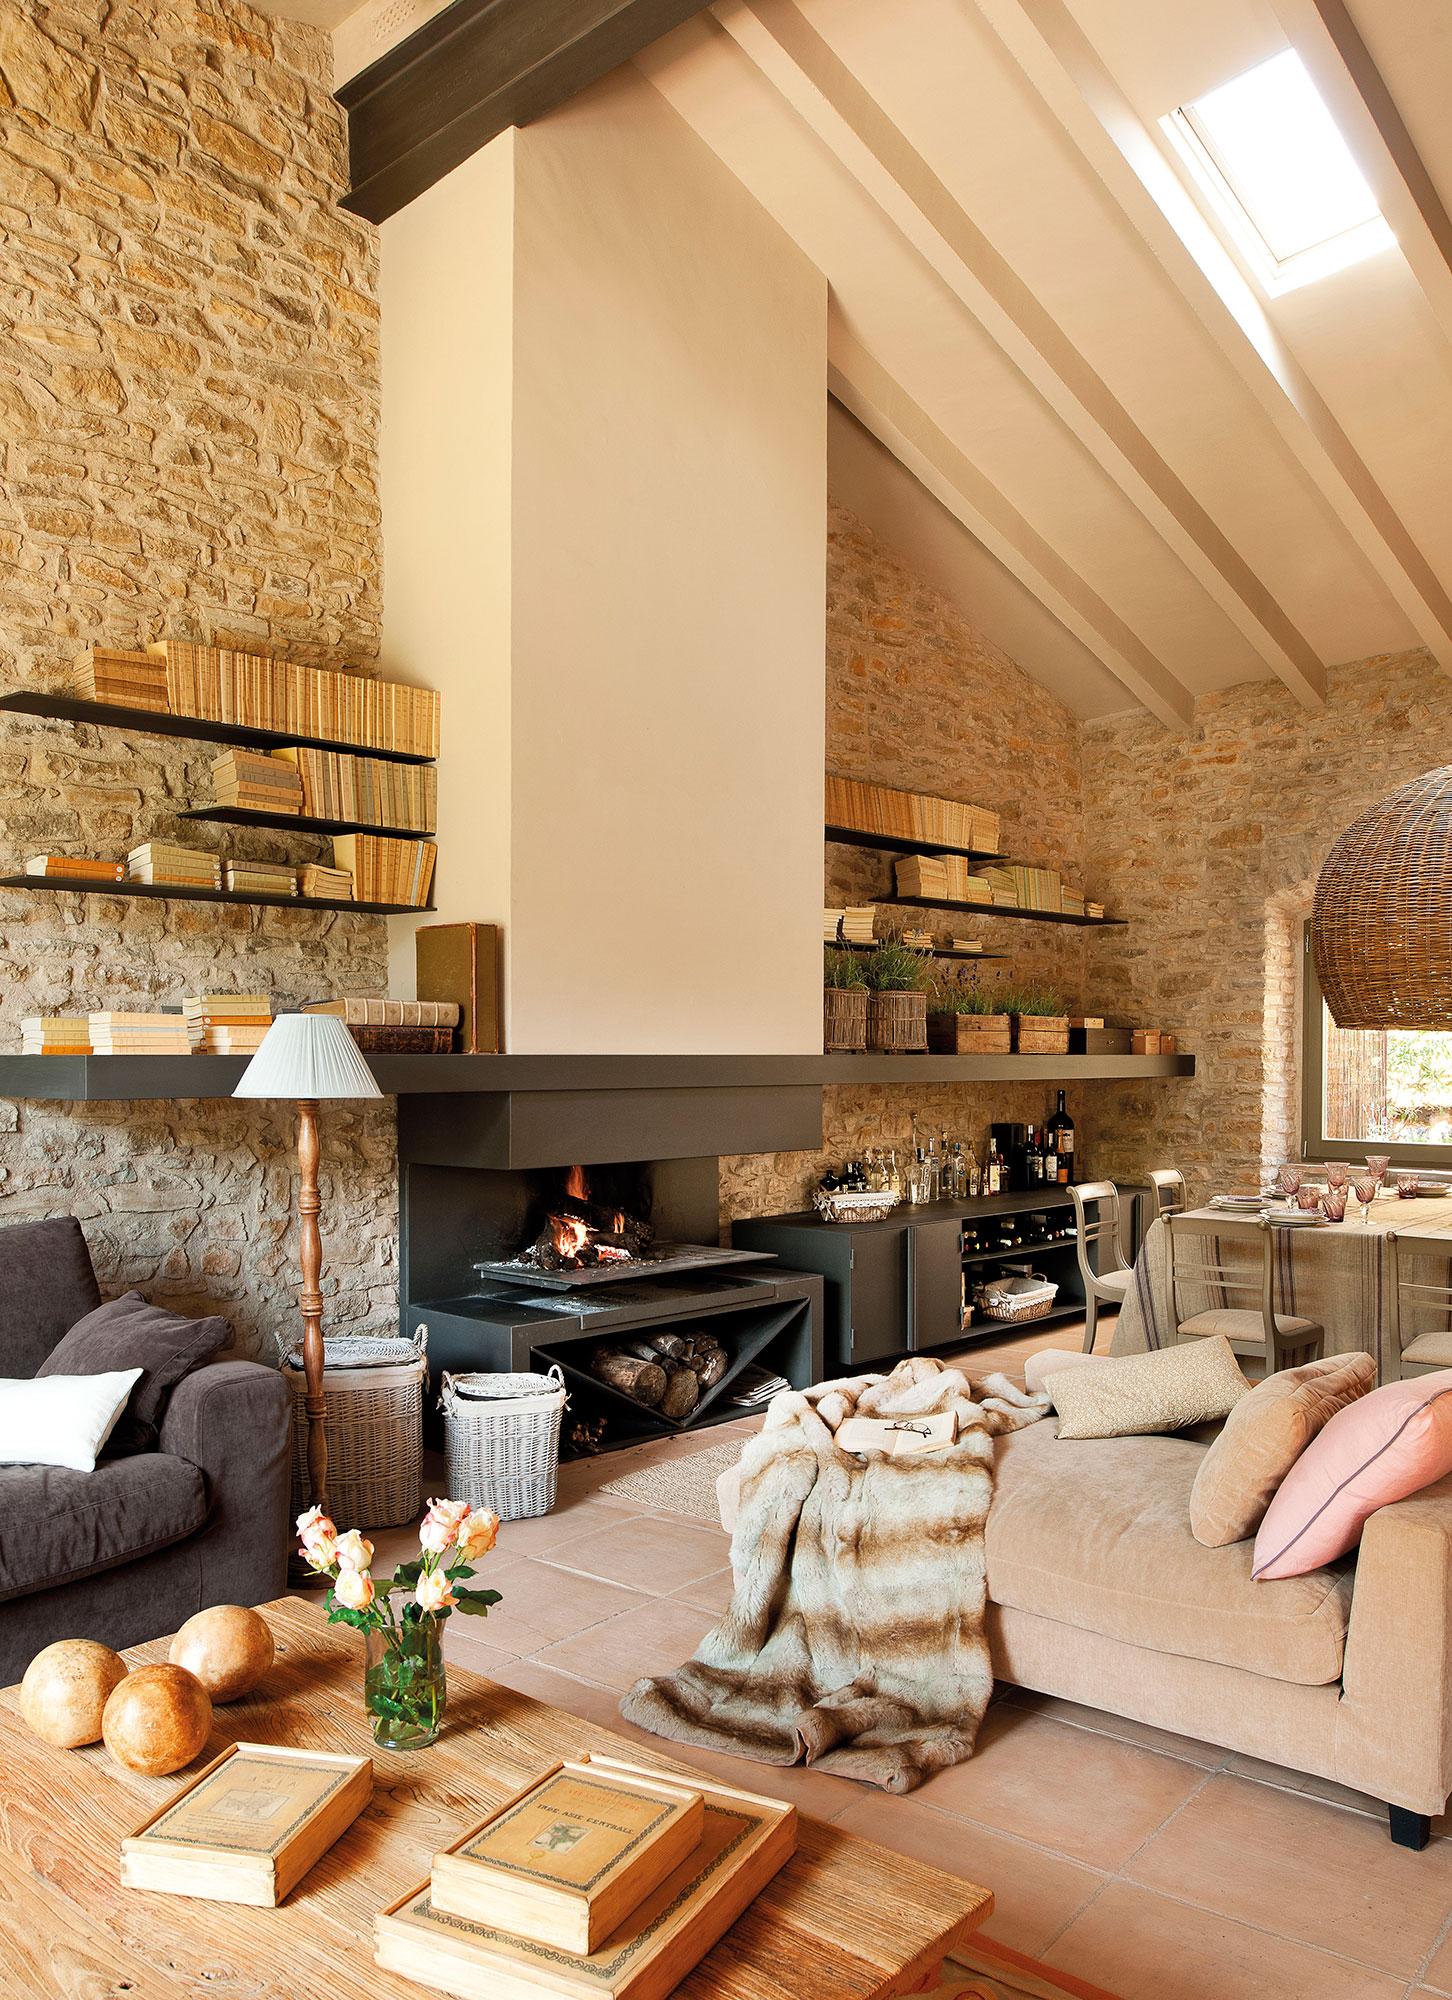 saln rstico con chimenea pared de piedra y ventana cenital